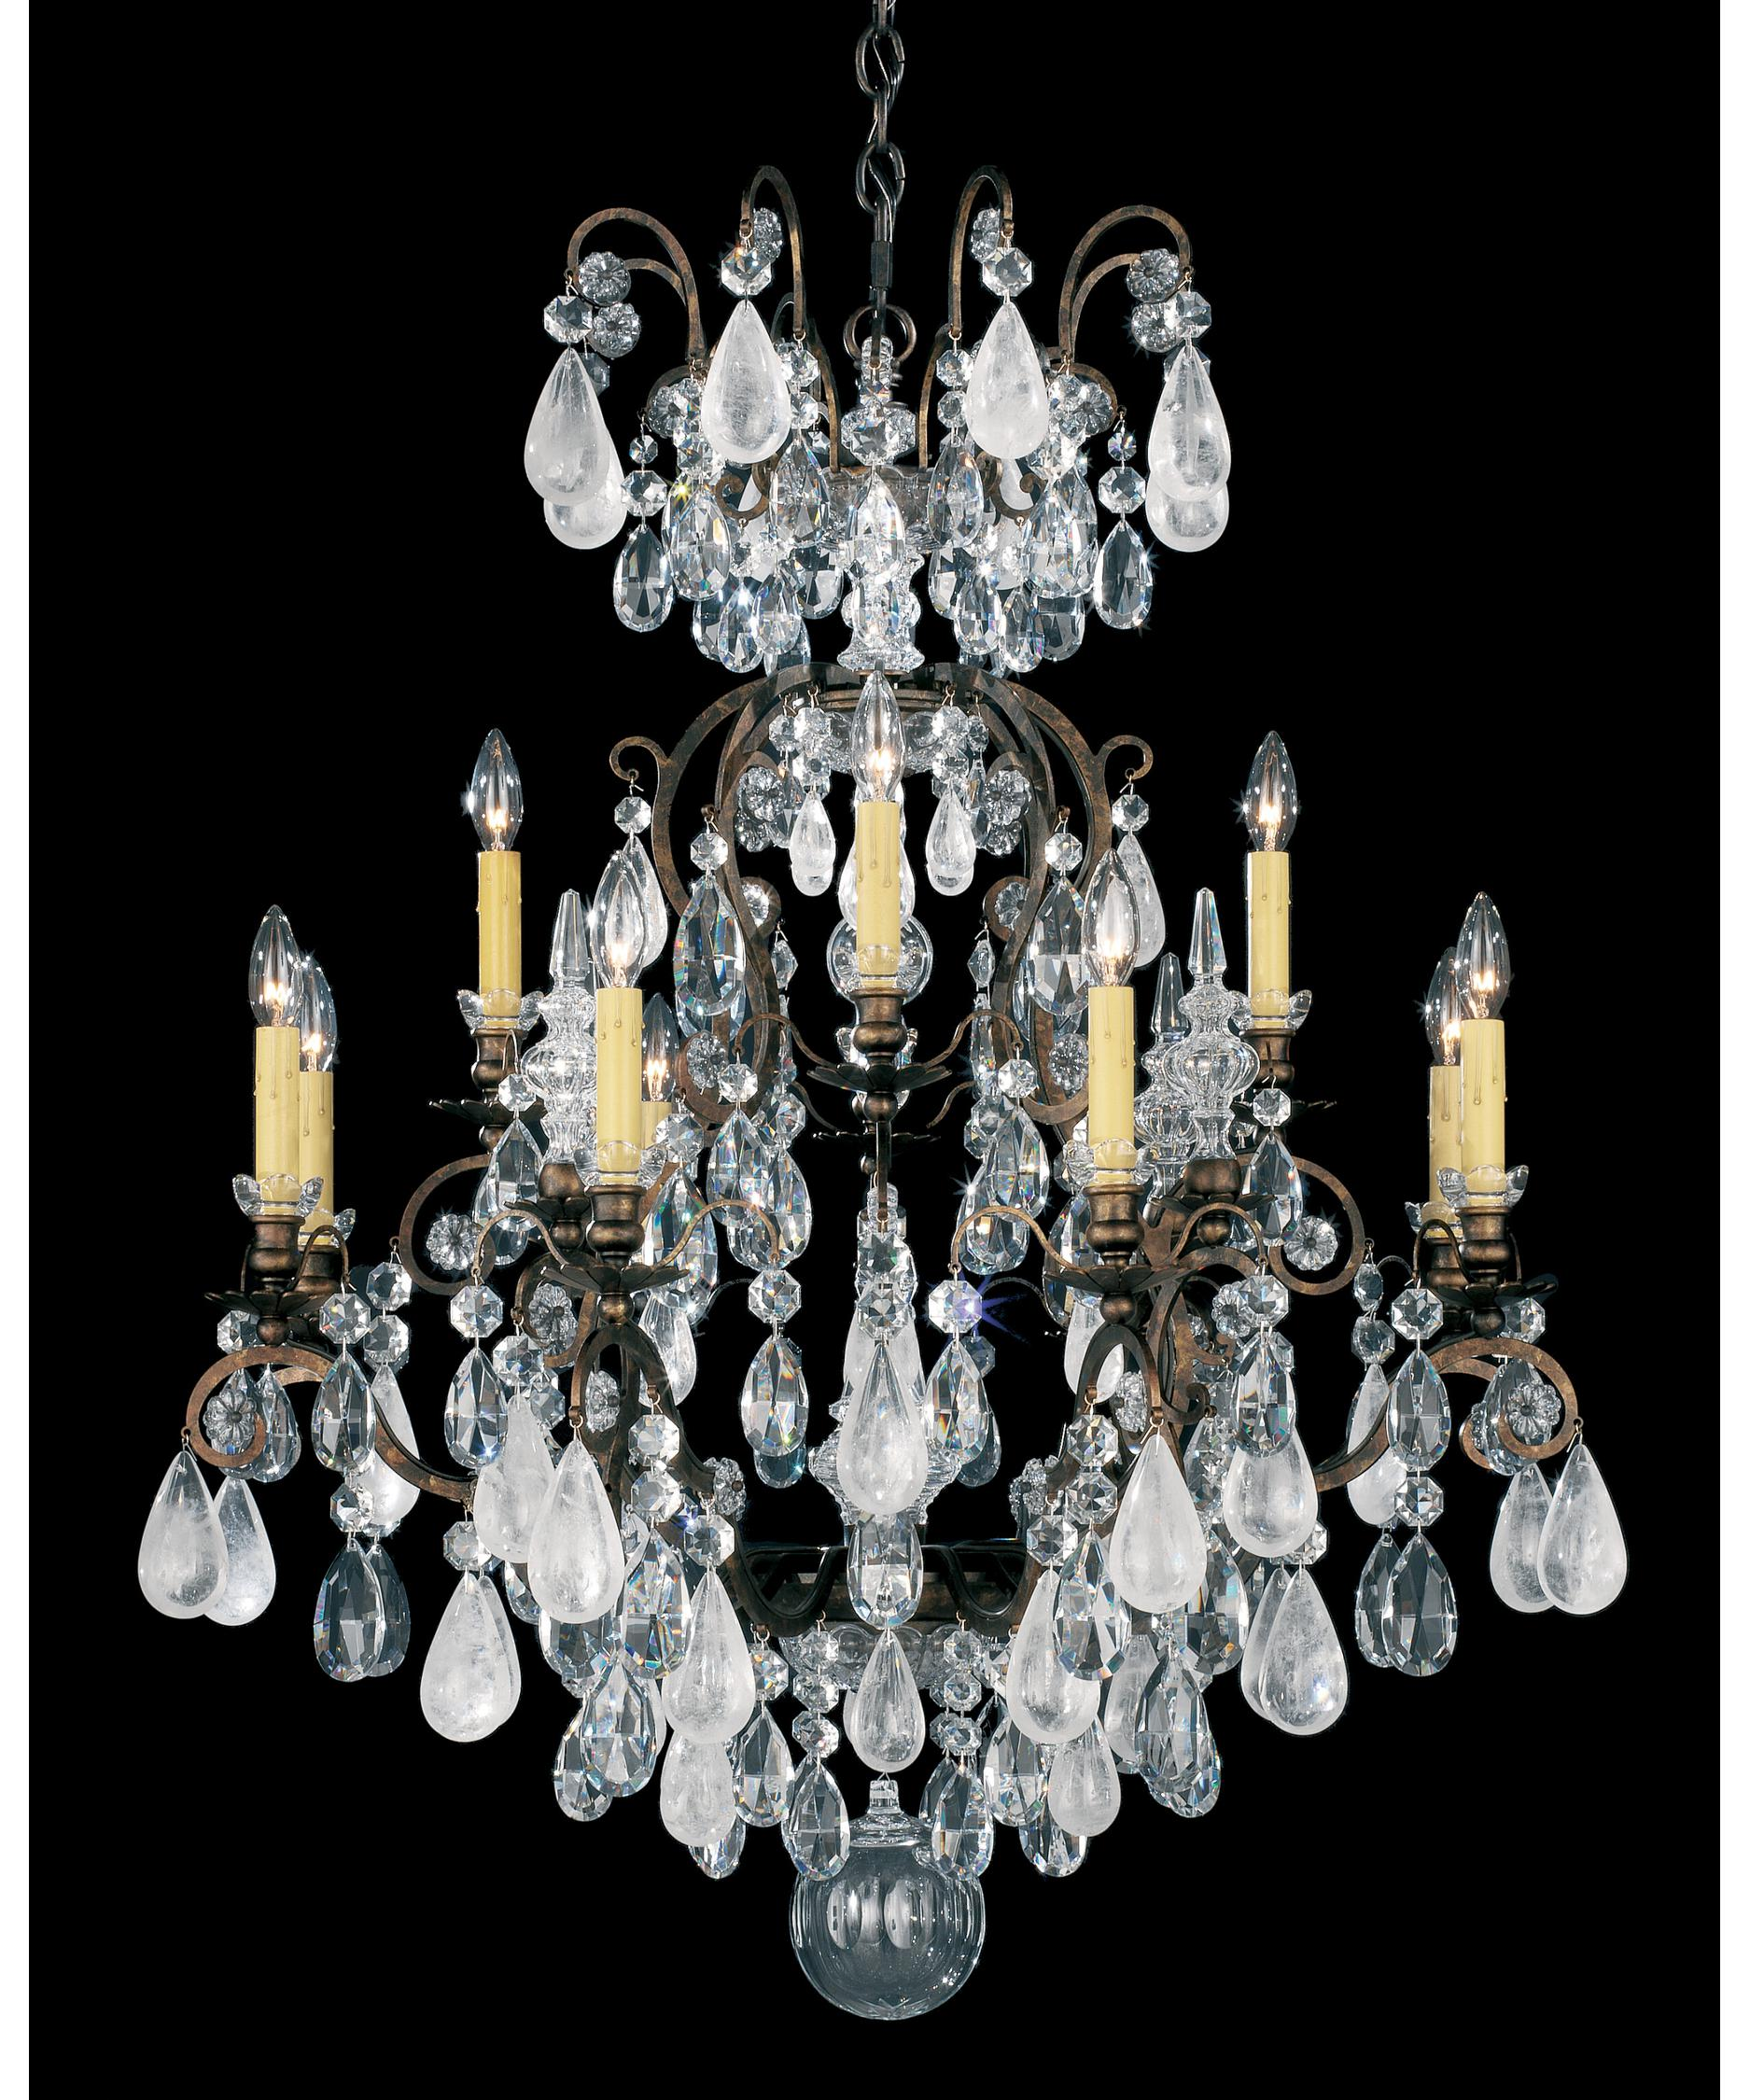 Schonbek Renaissance Rock Crystal 32 Inch Wide 12 Light Chandelier – Rock Crystal Chandelier